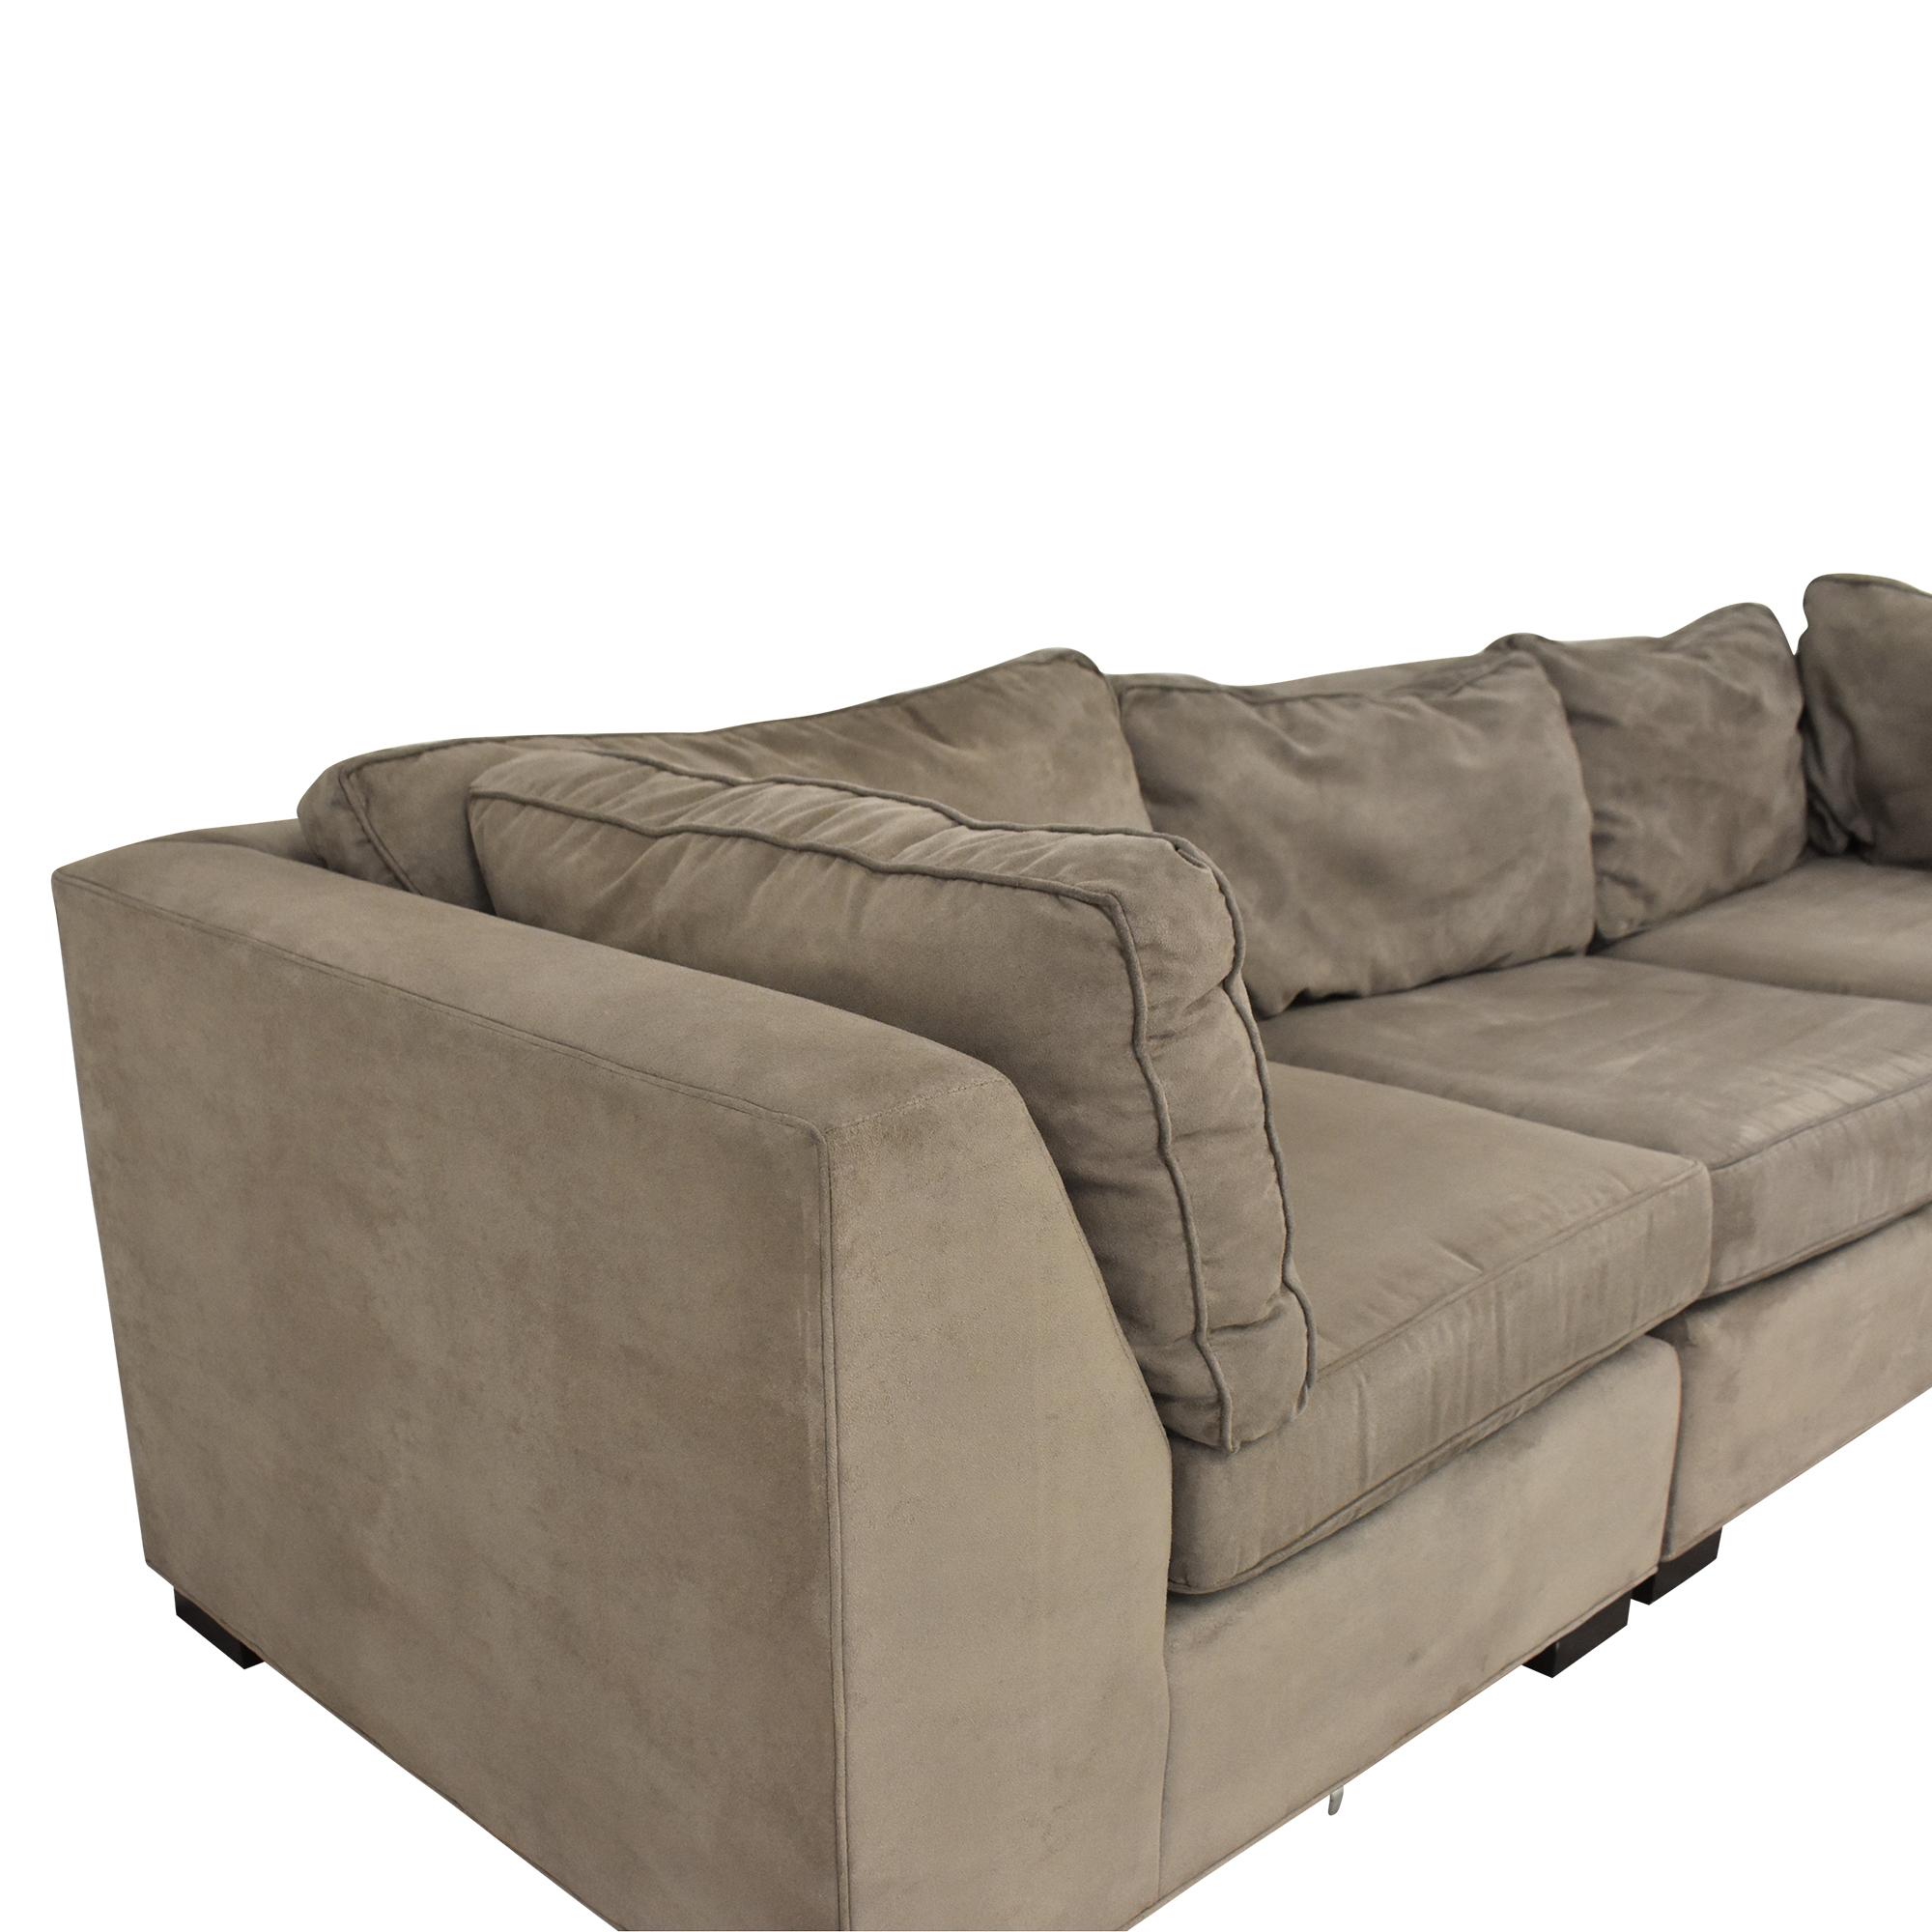 Mitchell Gold + Bob Williams Mitchell Gold + Bob Williams Sectional Sofa discount